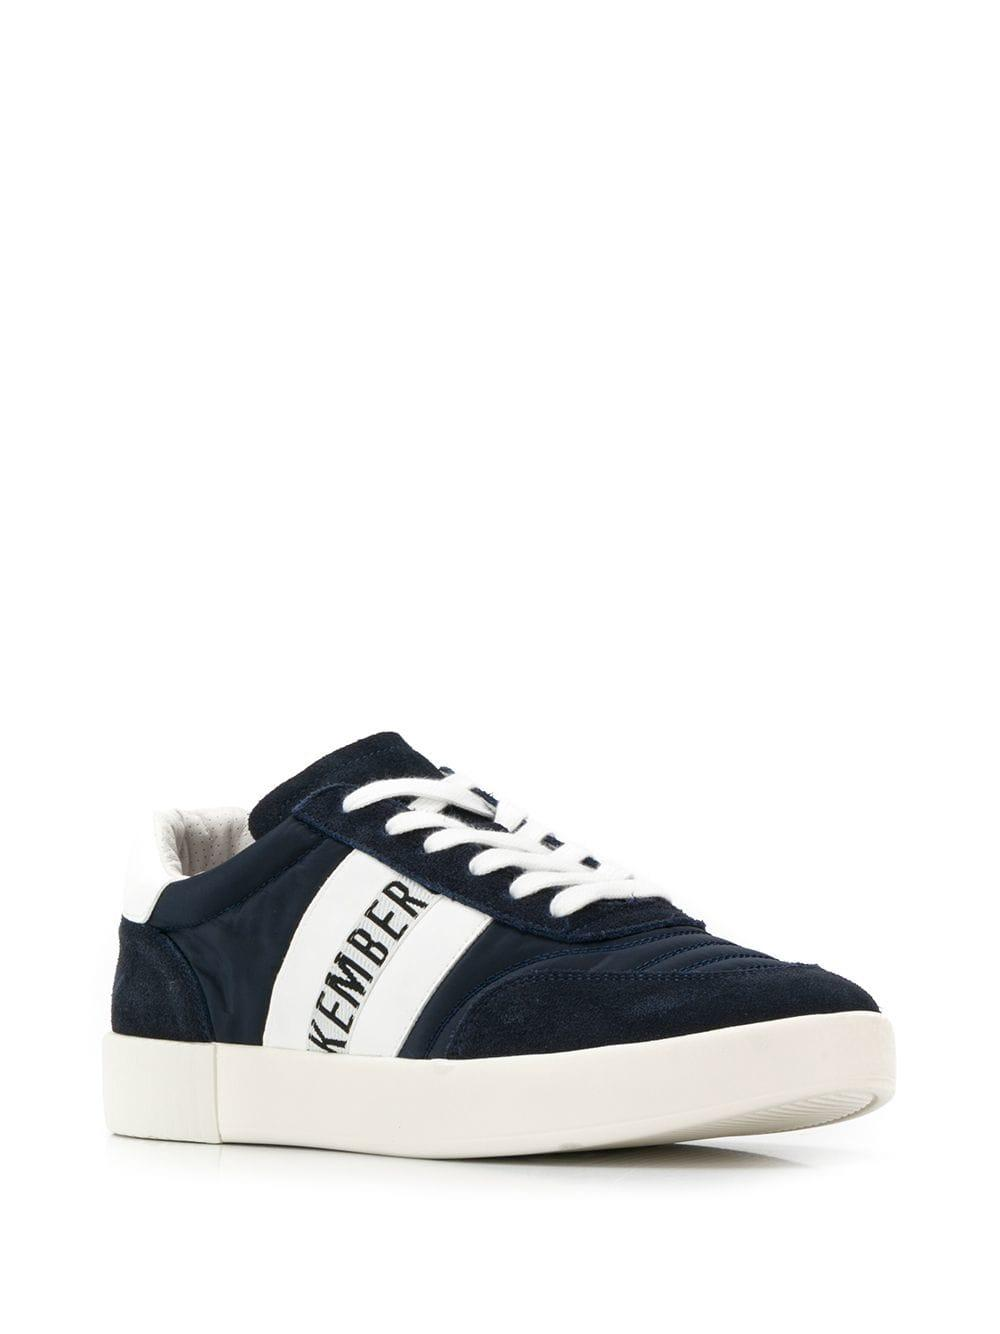 Top Dirk Bikkembergs Men In Sneakers Lyst Lo Brand Classic For Blue cL35Rq4jA